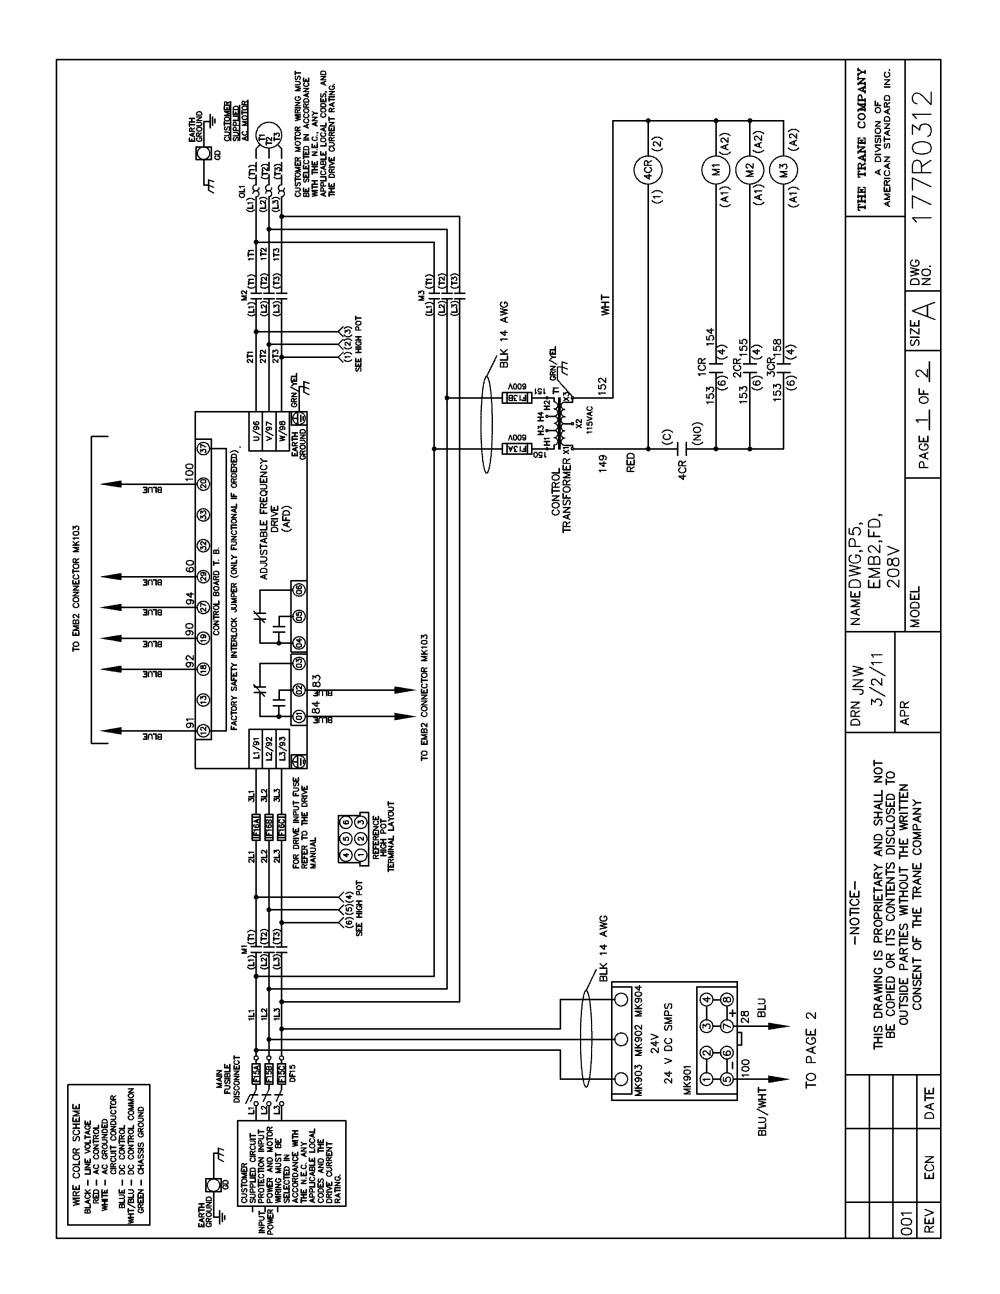 medium resolution of 677 beam wiring diagram wiring diagram advance photoelectric wiring diagram 677 beam wiring diagram wiring diagram